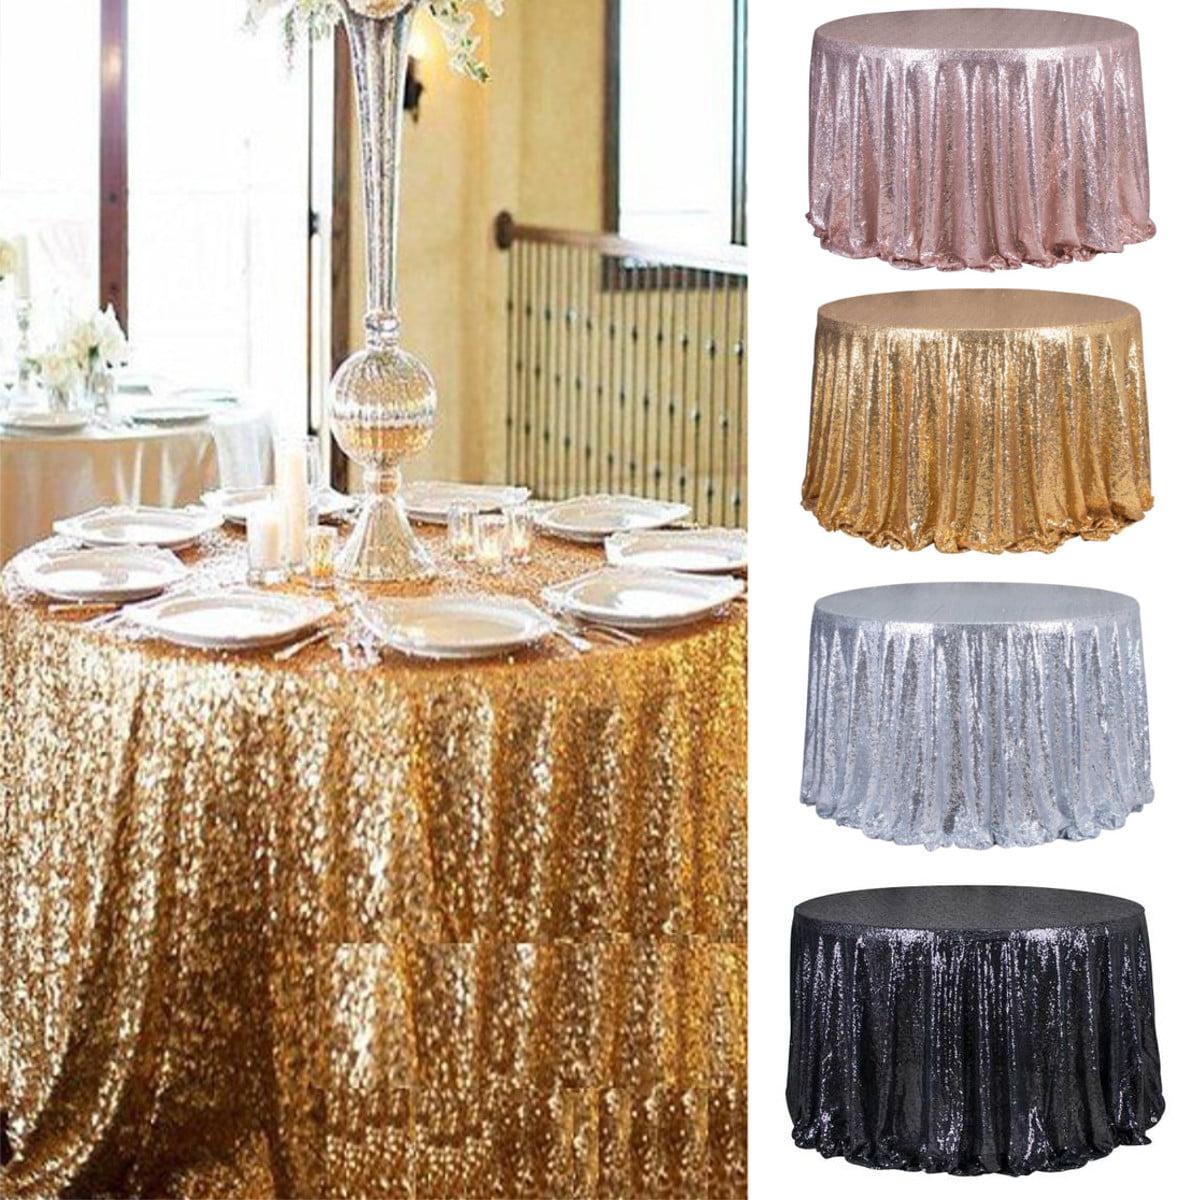 Round 47u0027u0027 Sparkle Sequin Tablecloth Cover Wedding Party Banquet Table  Decor - Walmart.com